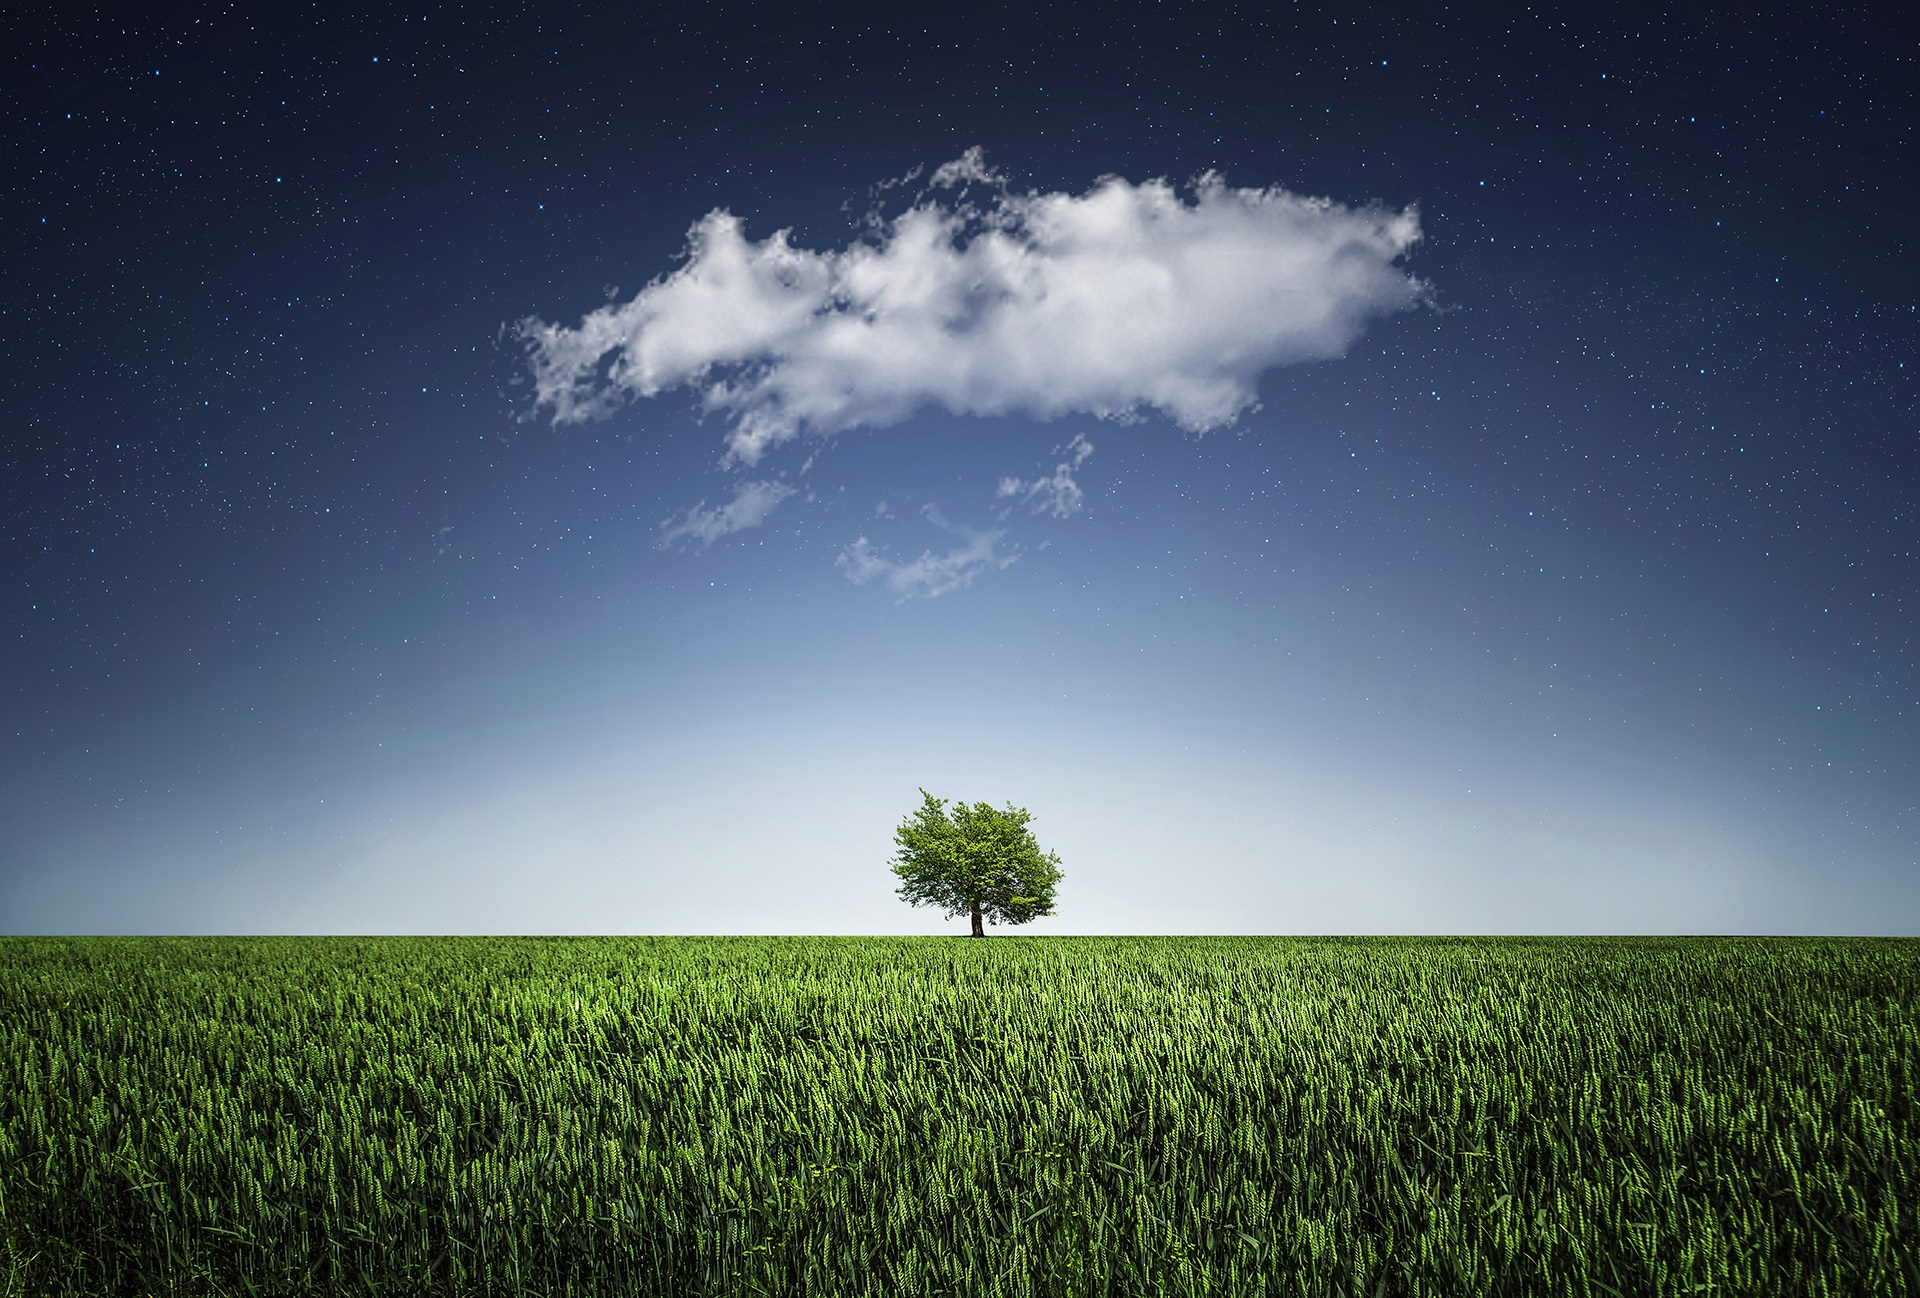 albero, pianura, Nuvola, Cielo, Soledad - Sfondi HD - Professor-falken.com